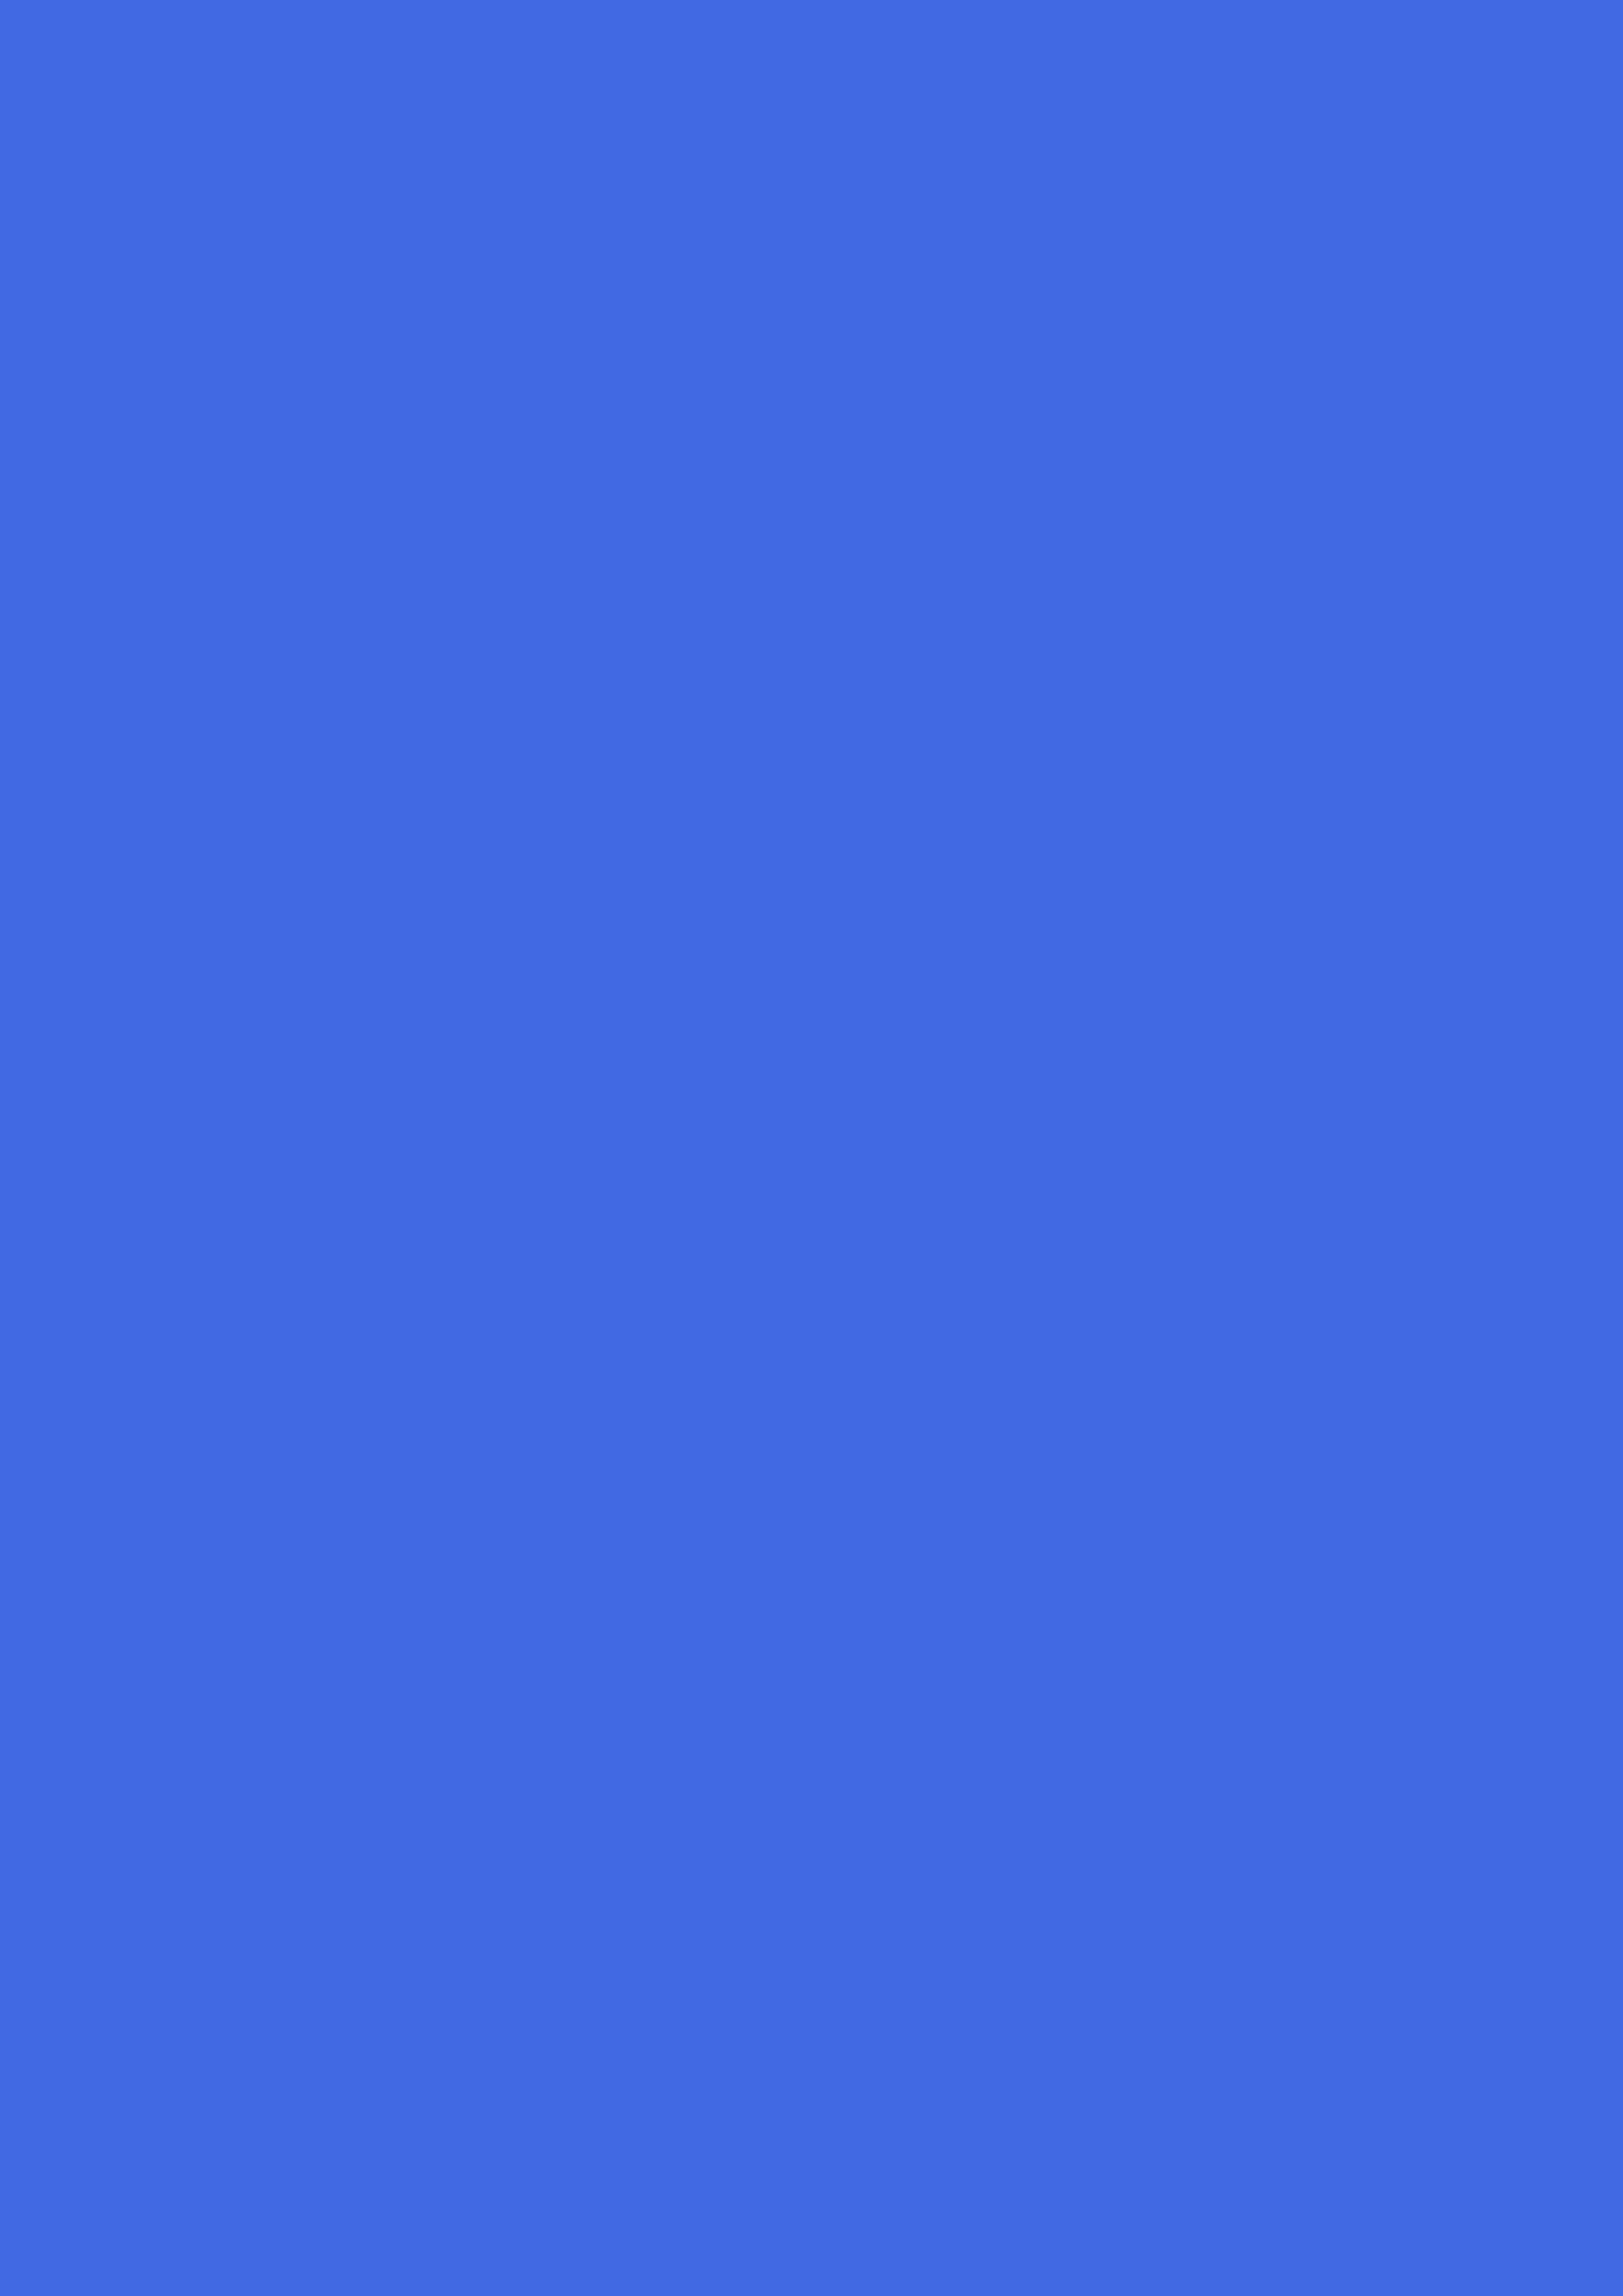 2480x3508 Royal Blue Web Solid Color Background